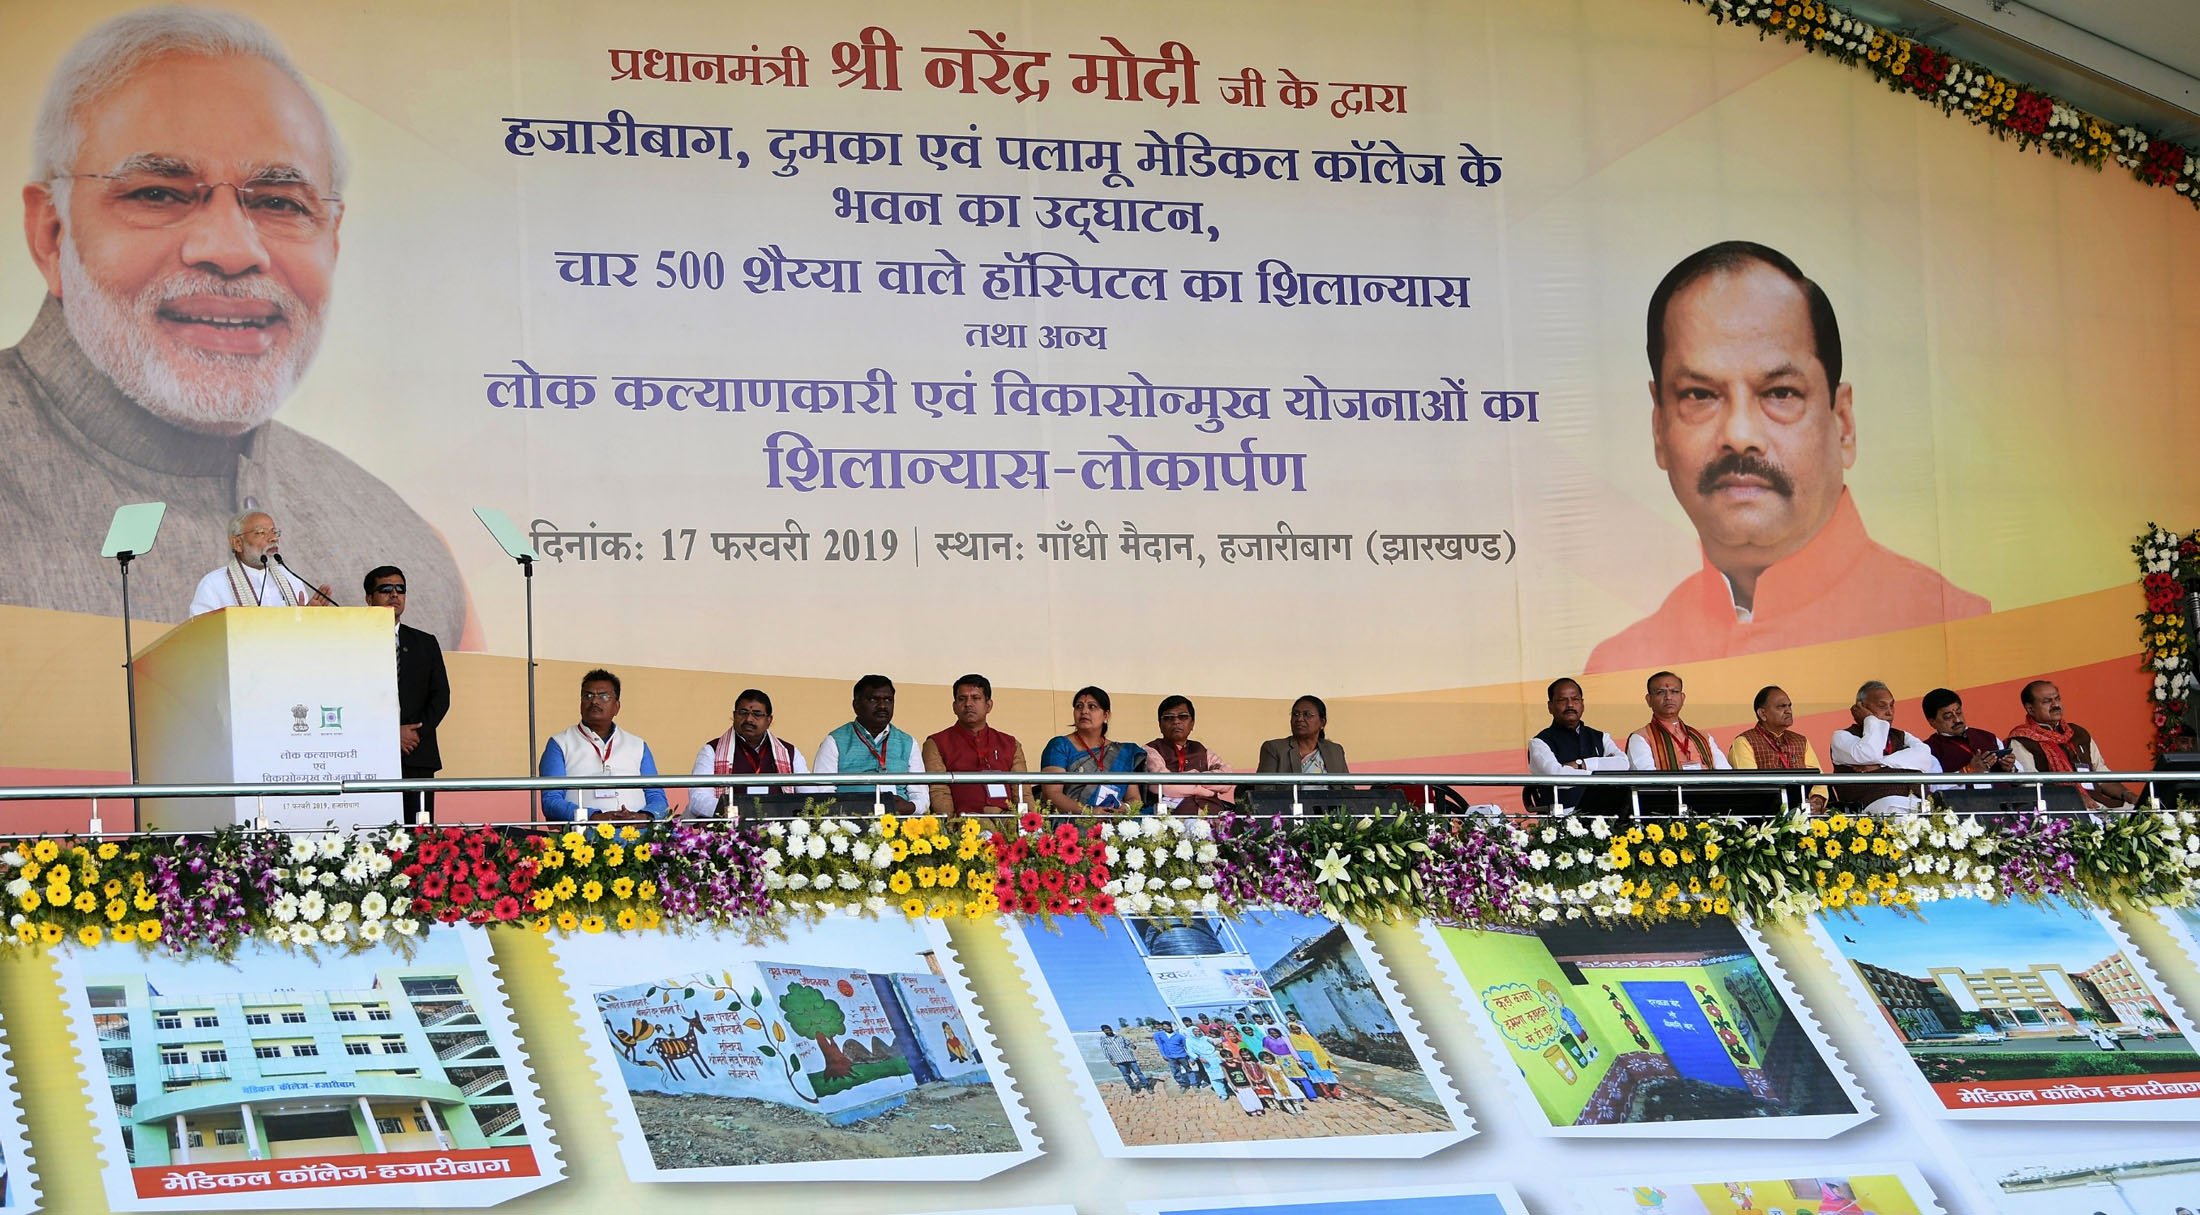 Narendra Modi dedicates to nation the Medical Colleges at Hazaribagh, Dumka and Palamu